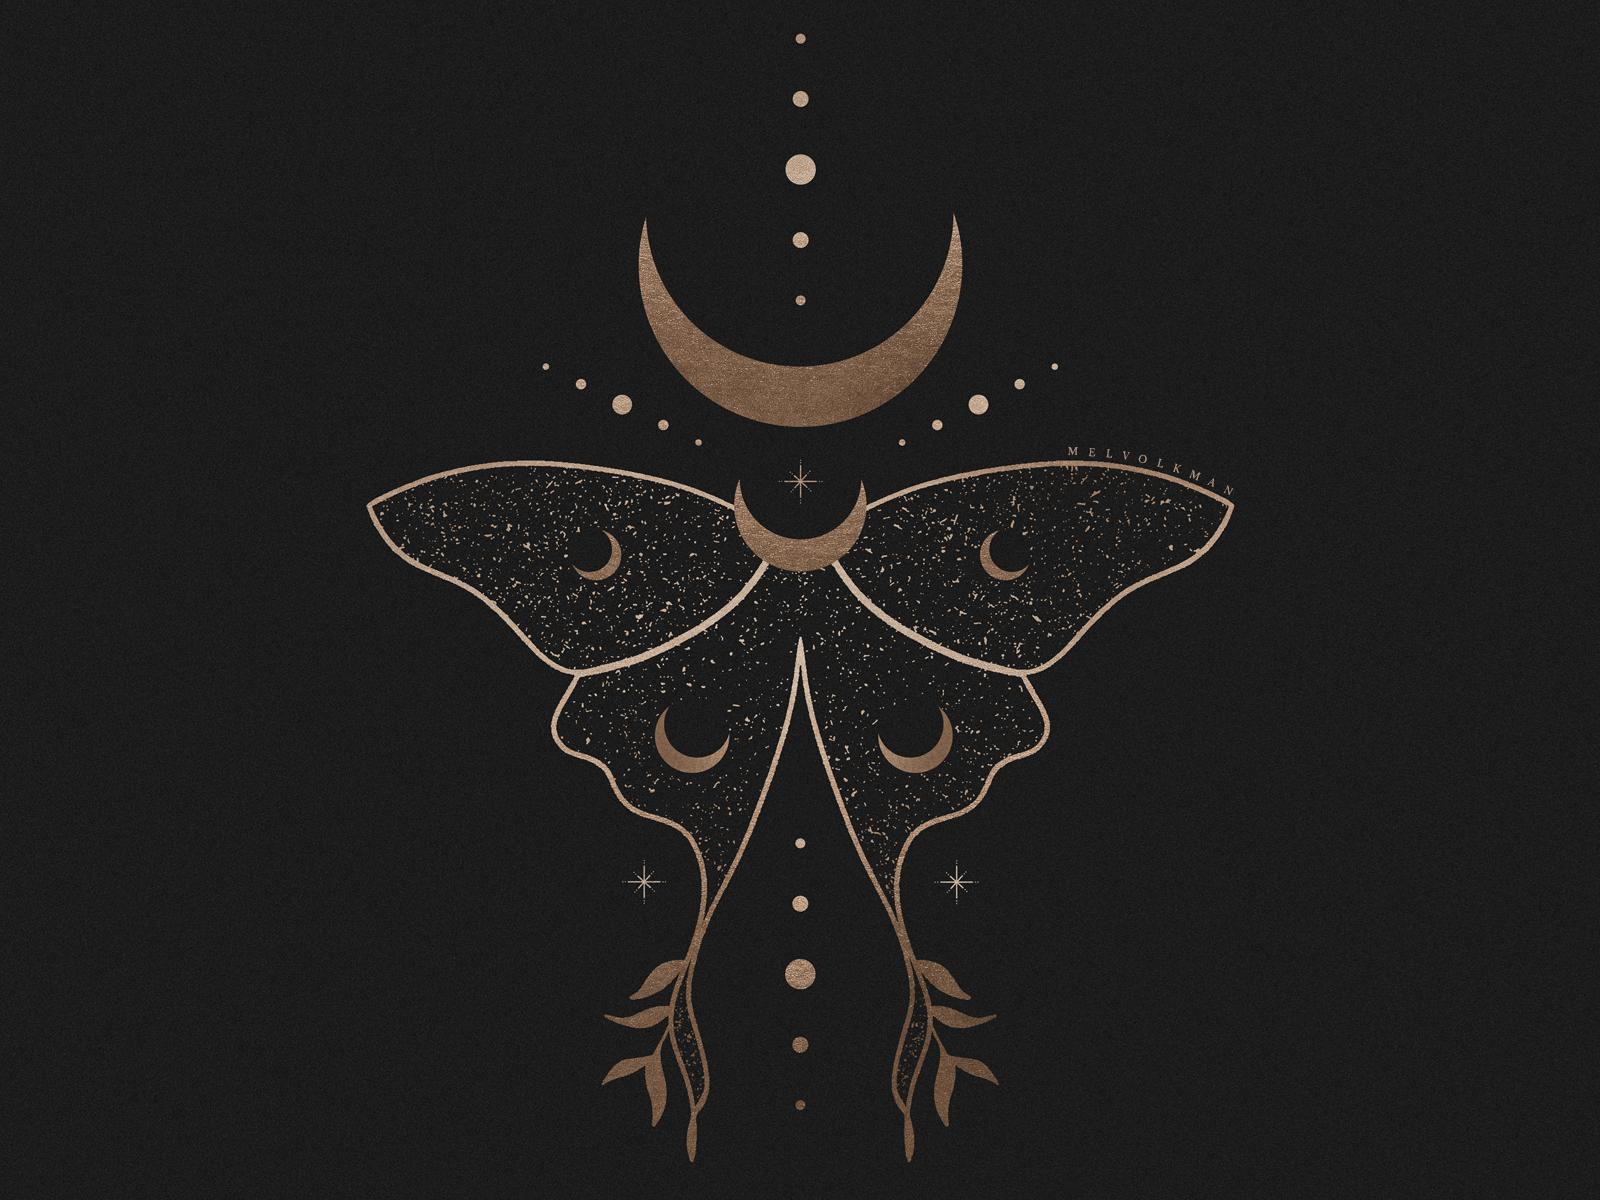 Cosmic Luna Moth Illustration By Mel Volkman by Mel Volkman | Dribbble